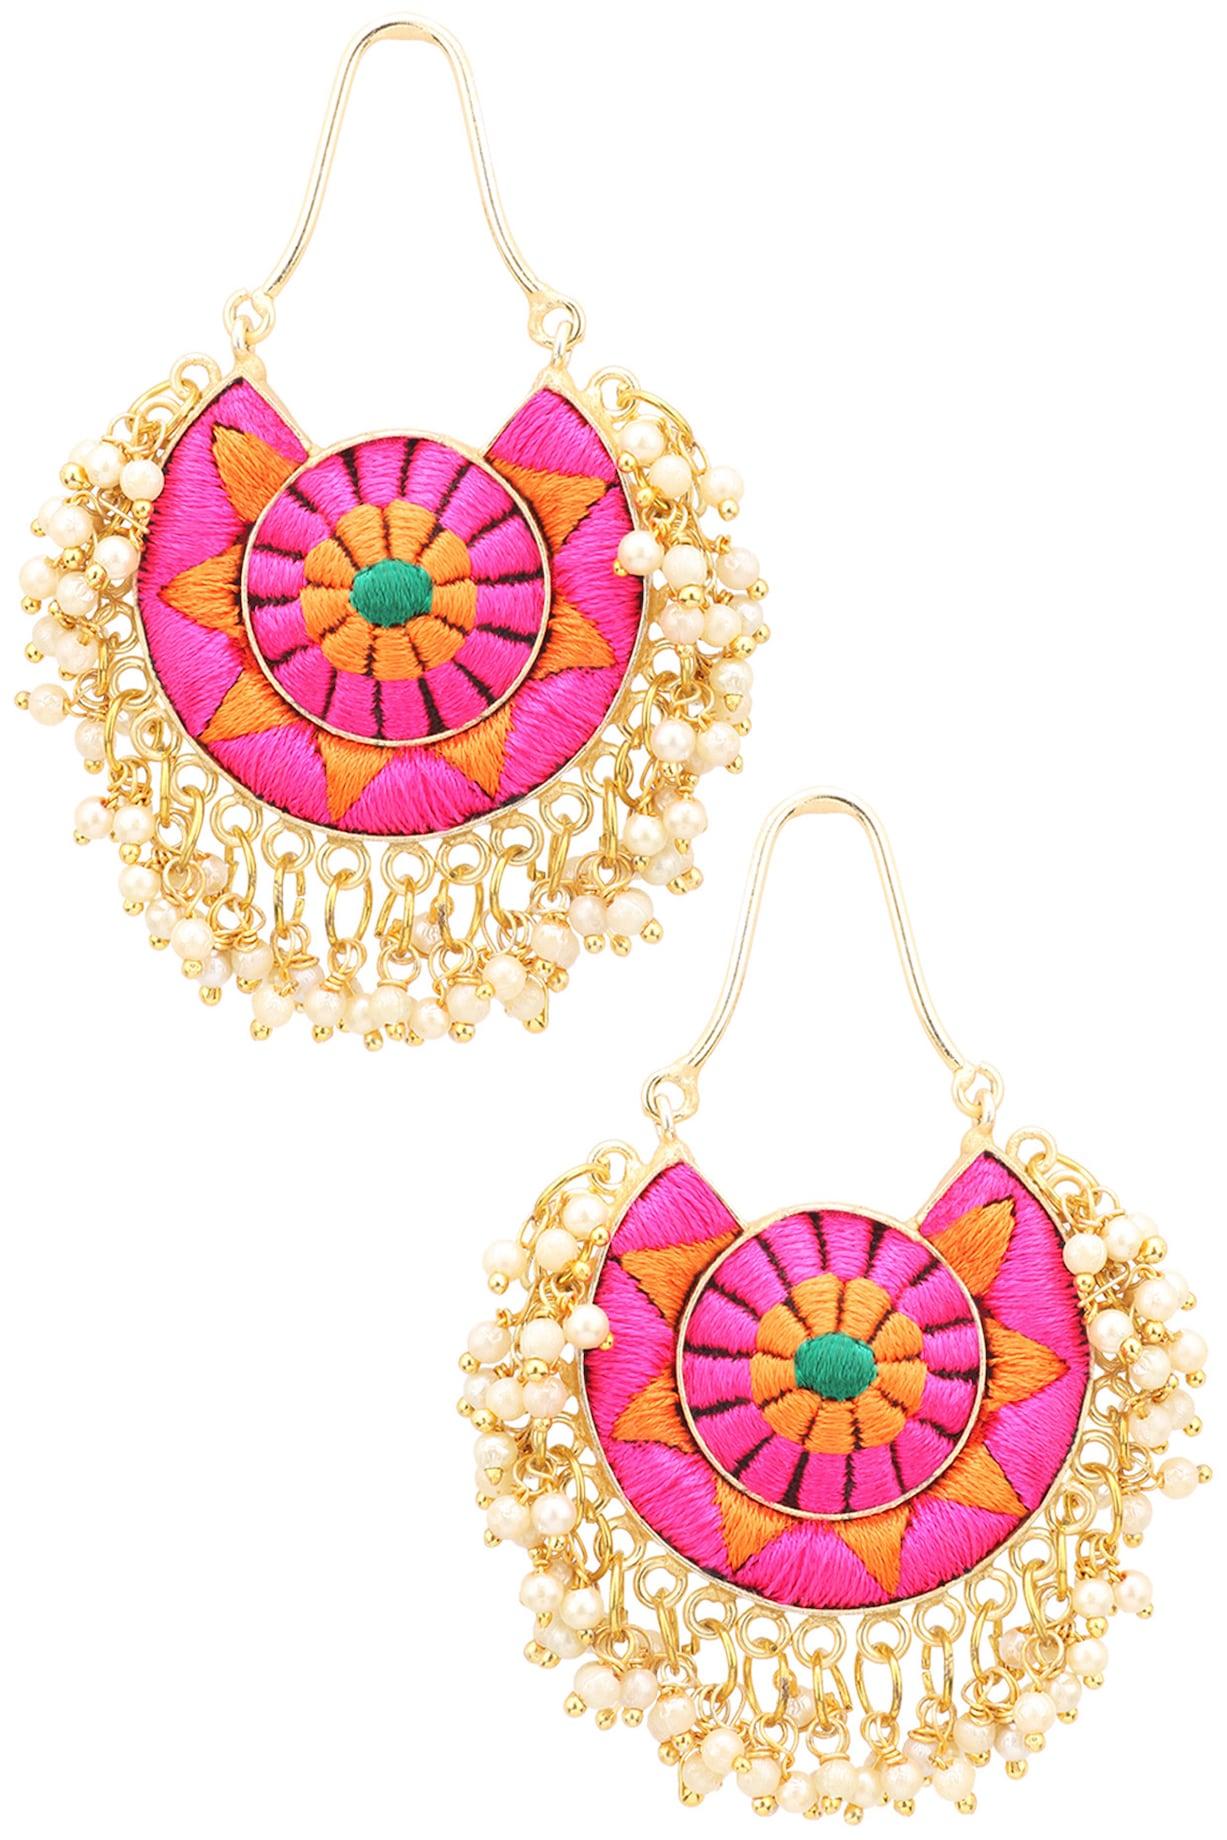 Bauble Bazaar Earrings